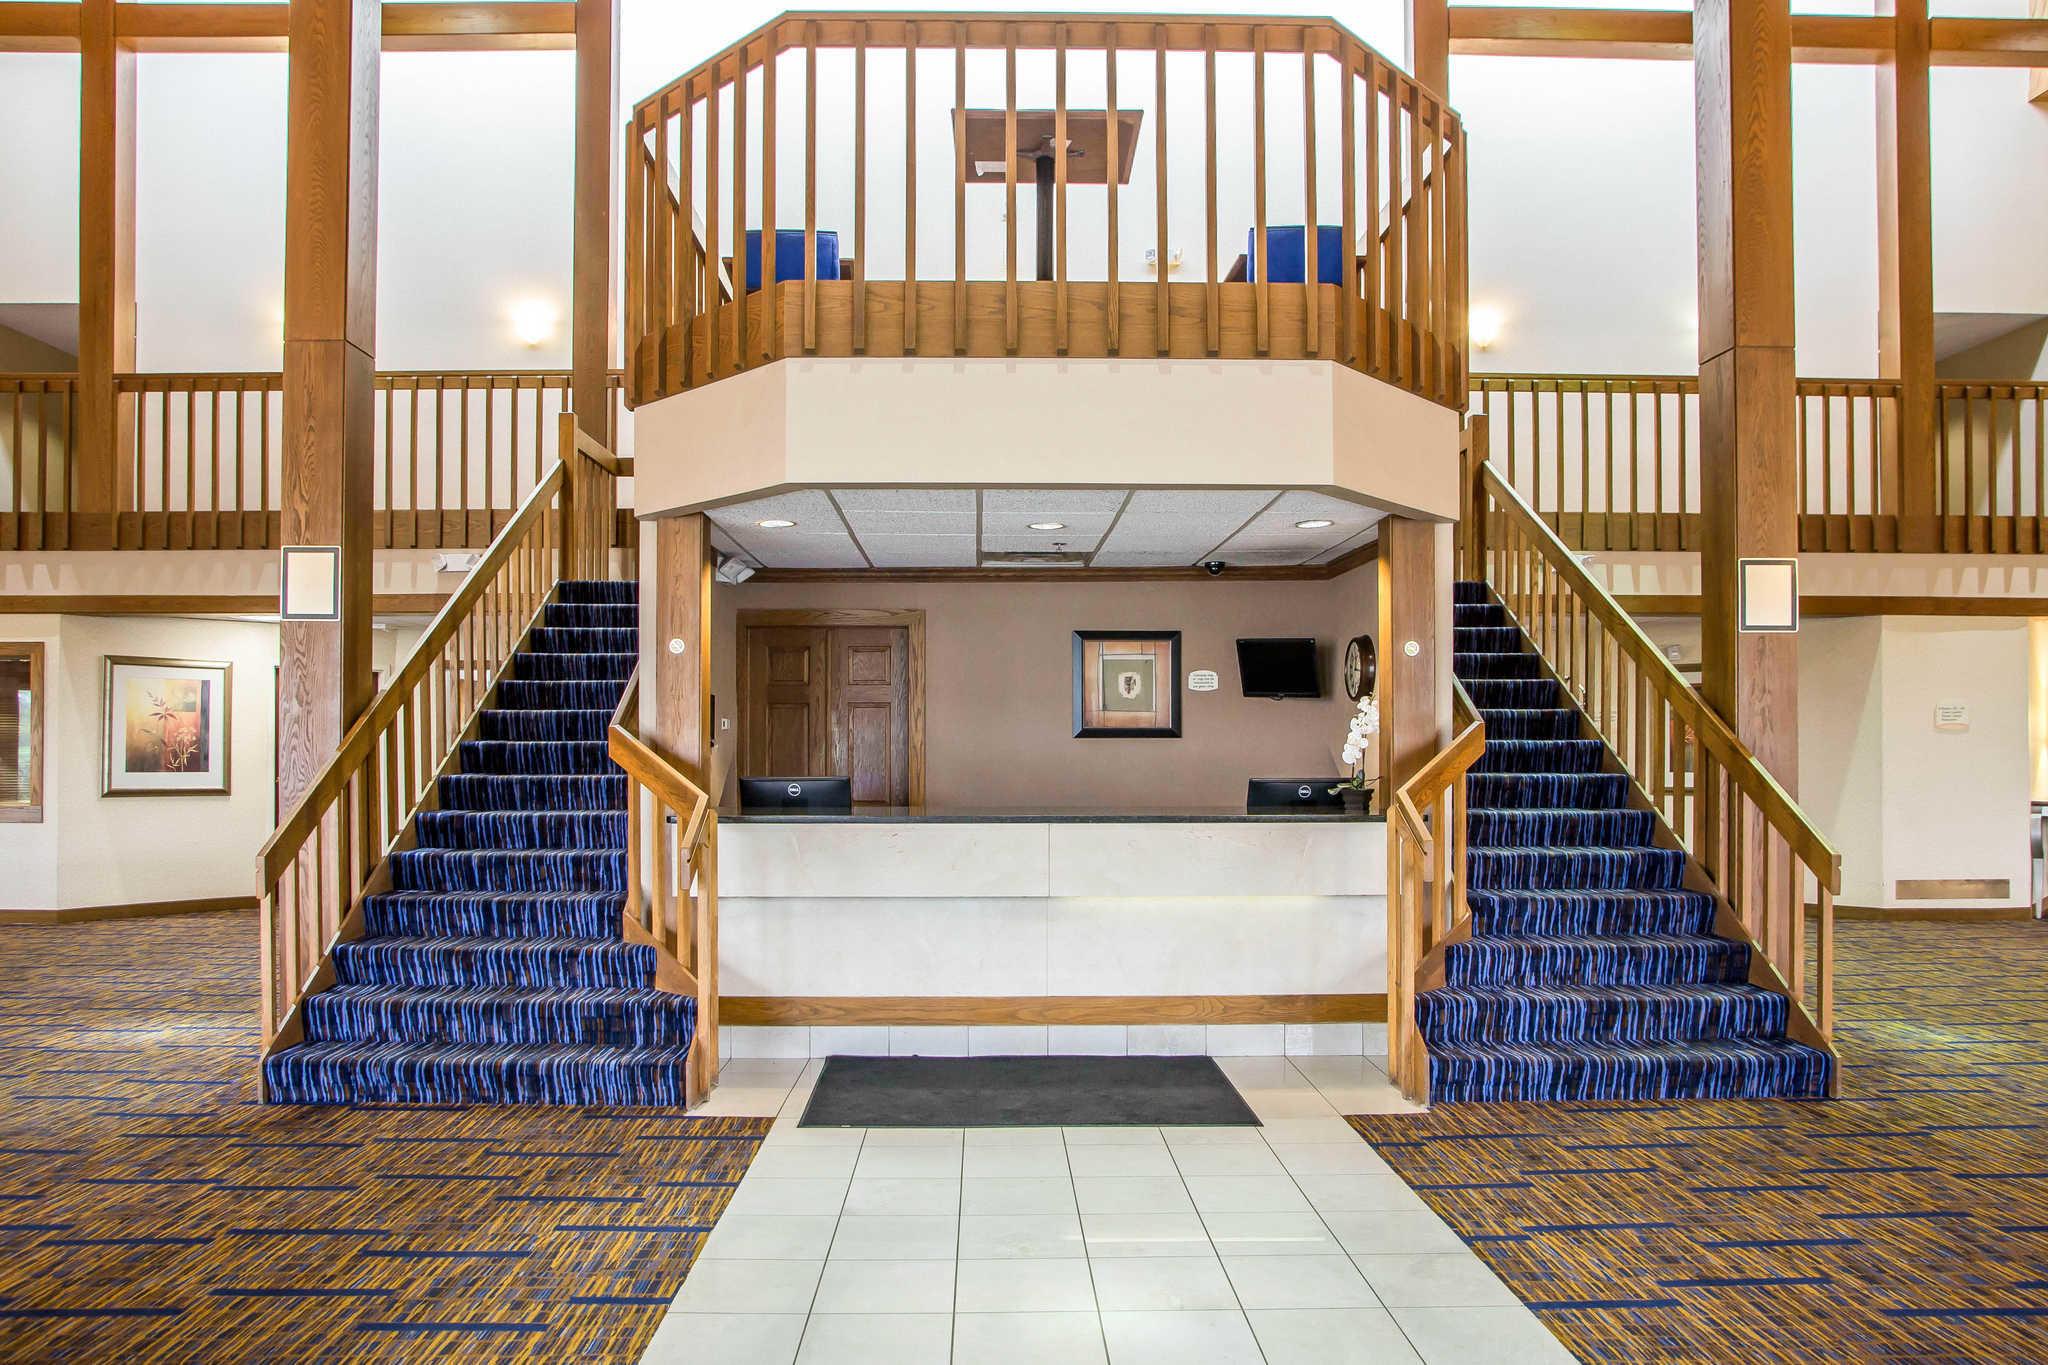 Clarion Inn image 6